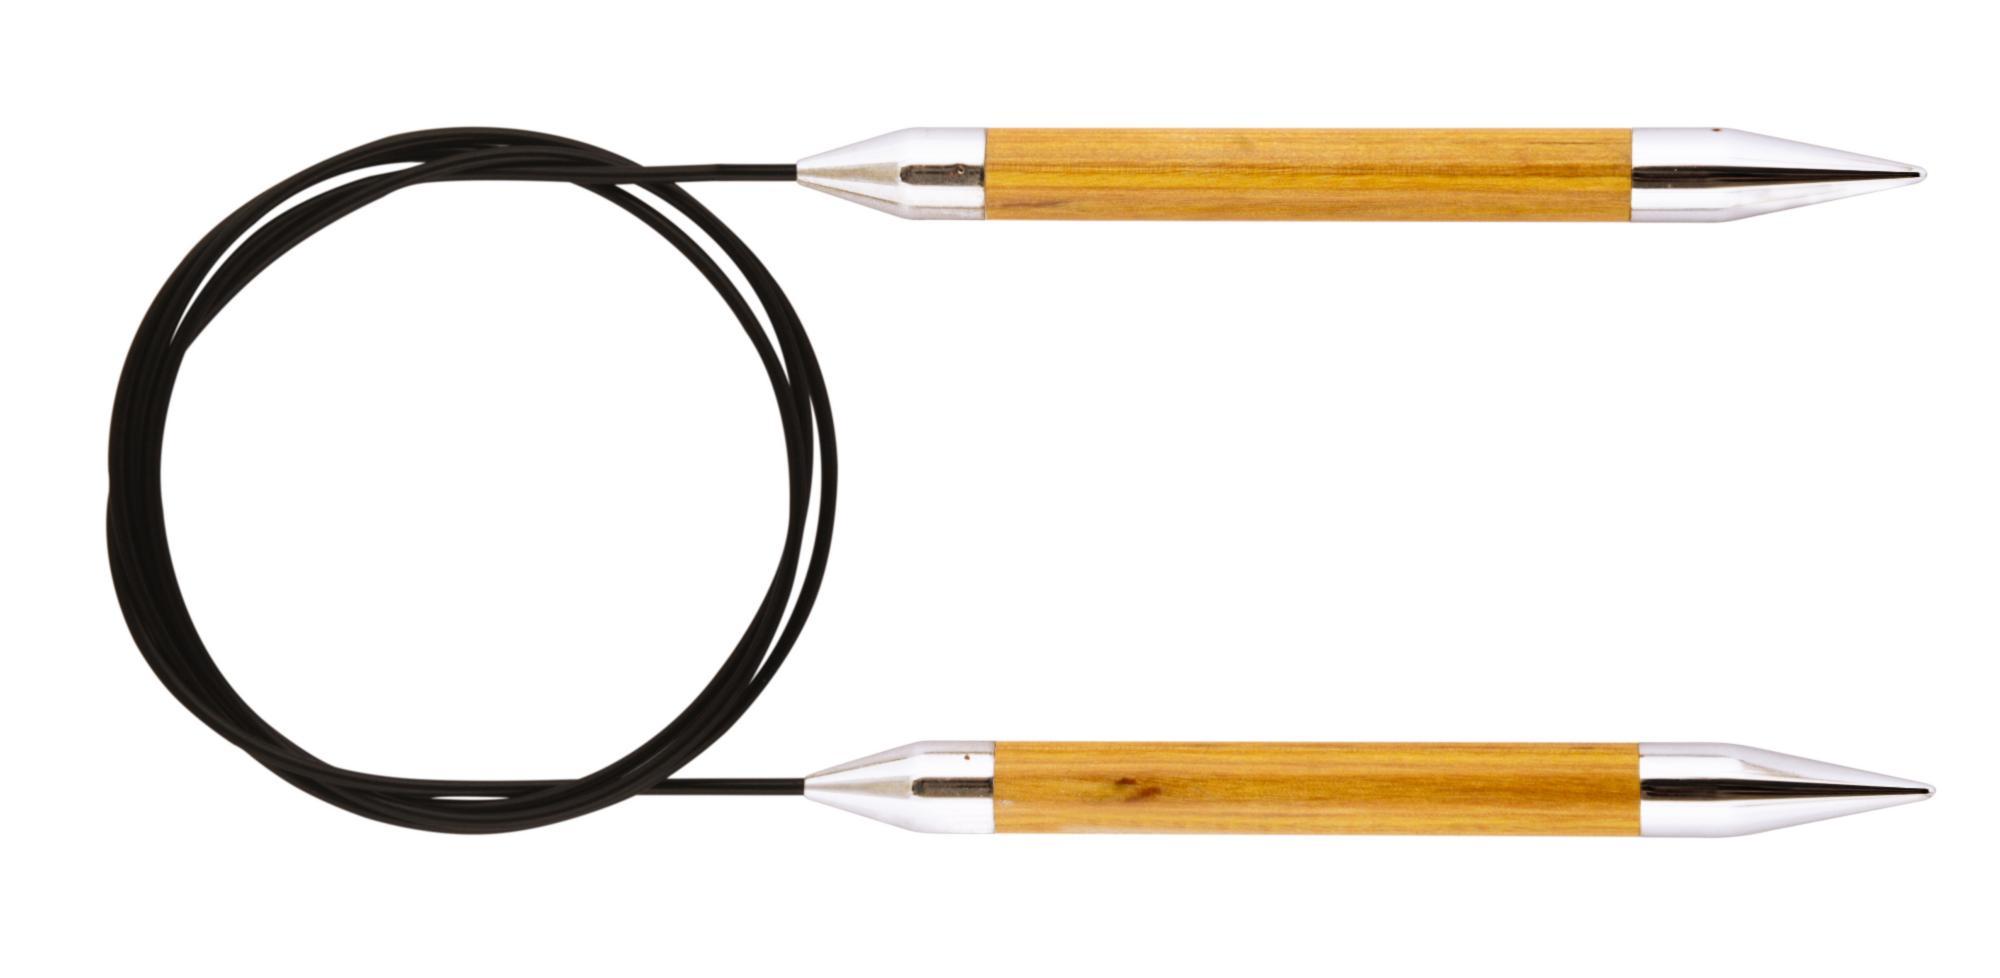 Спицы круговые 120 см Royale KnitPro, 29145, 12.00 мм